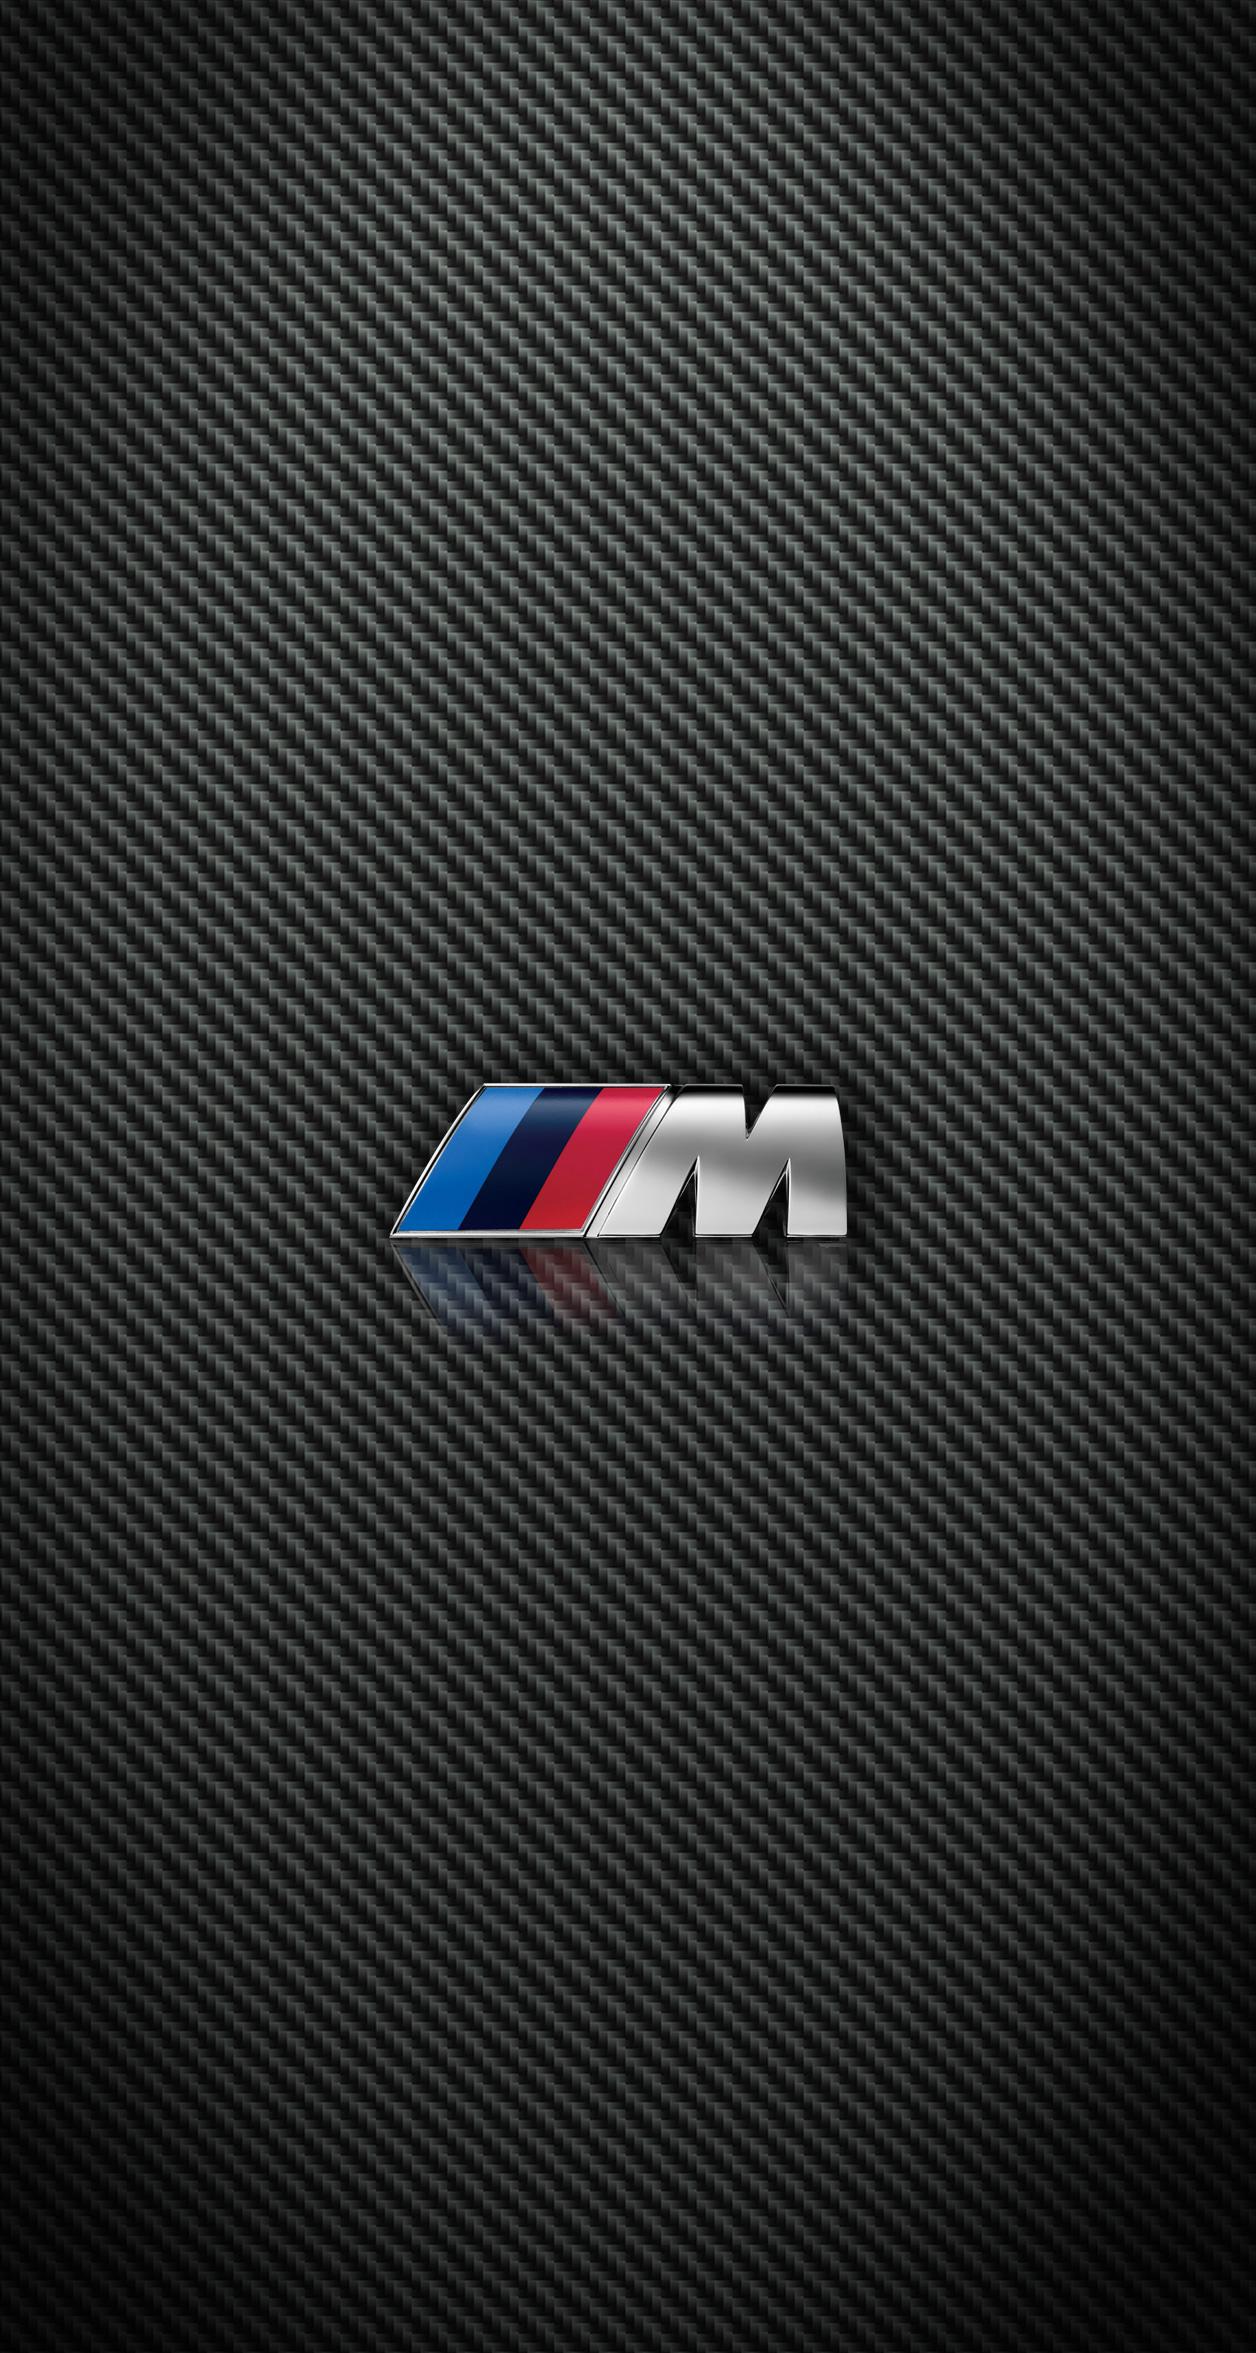 bmw-m-iPhone6+.jpg